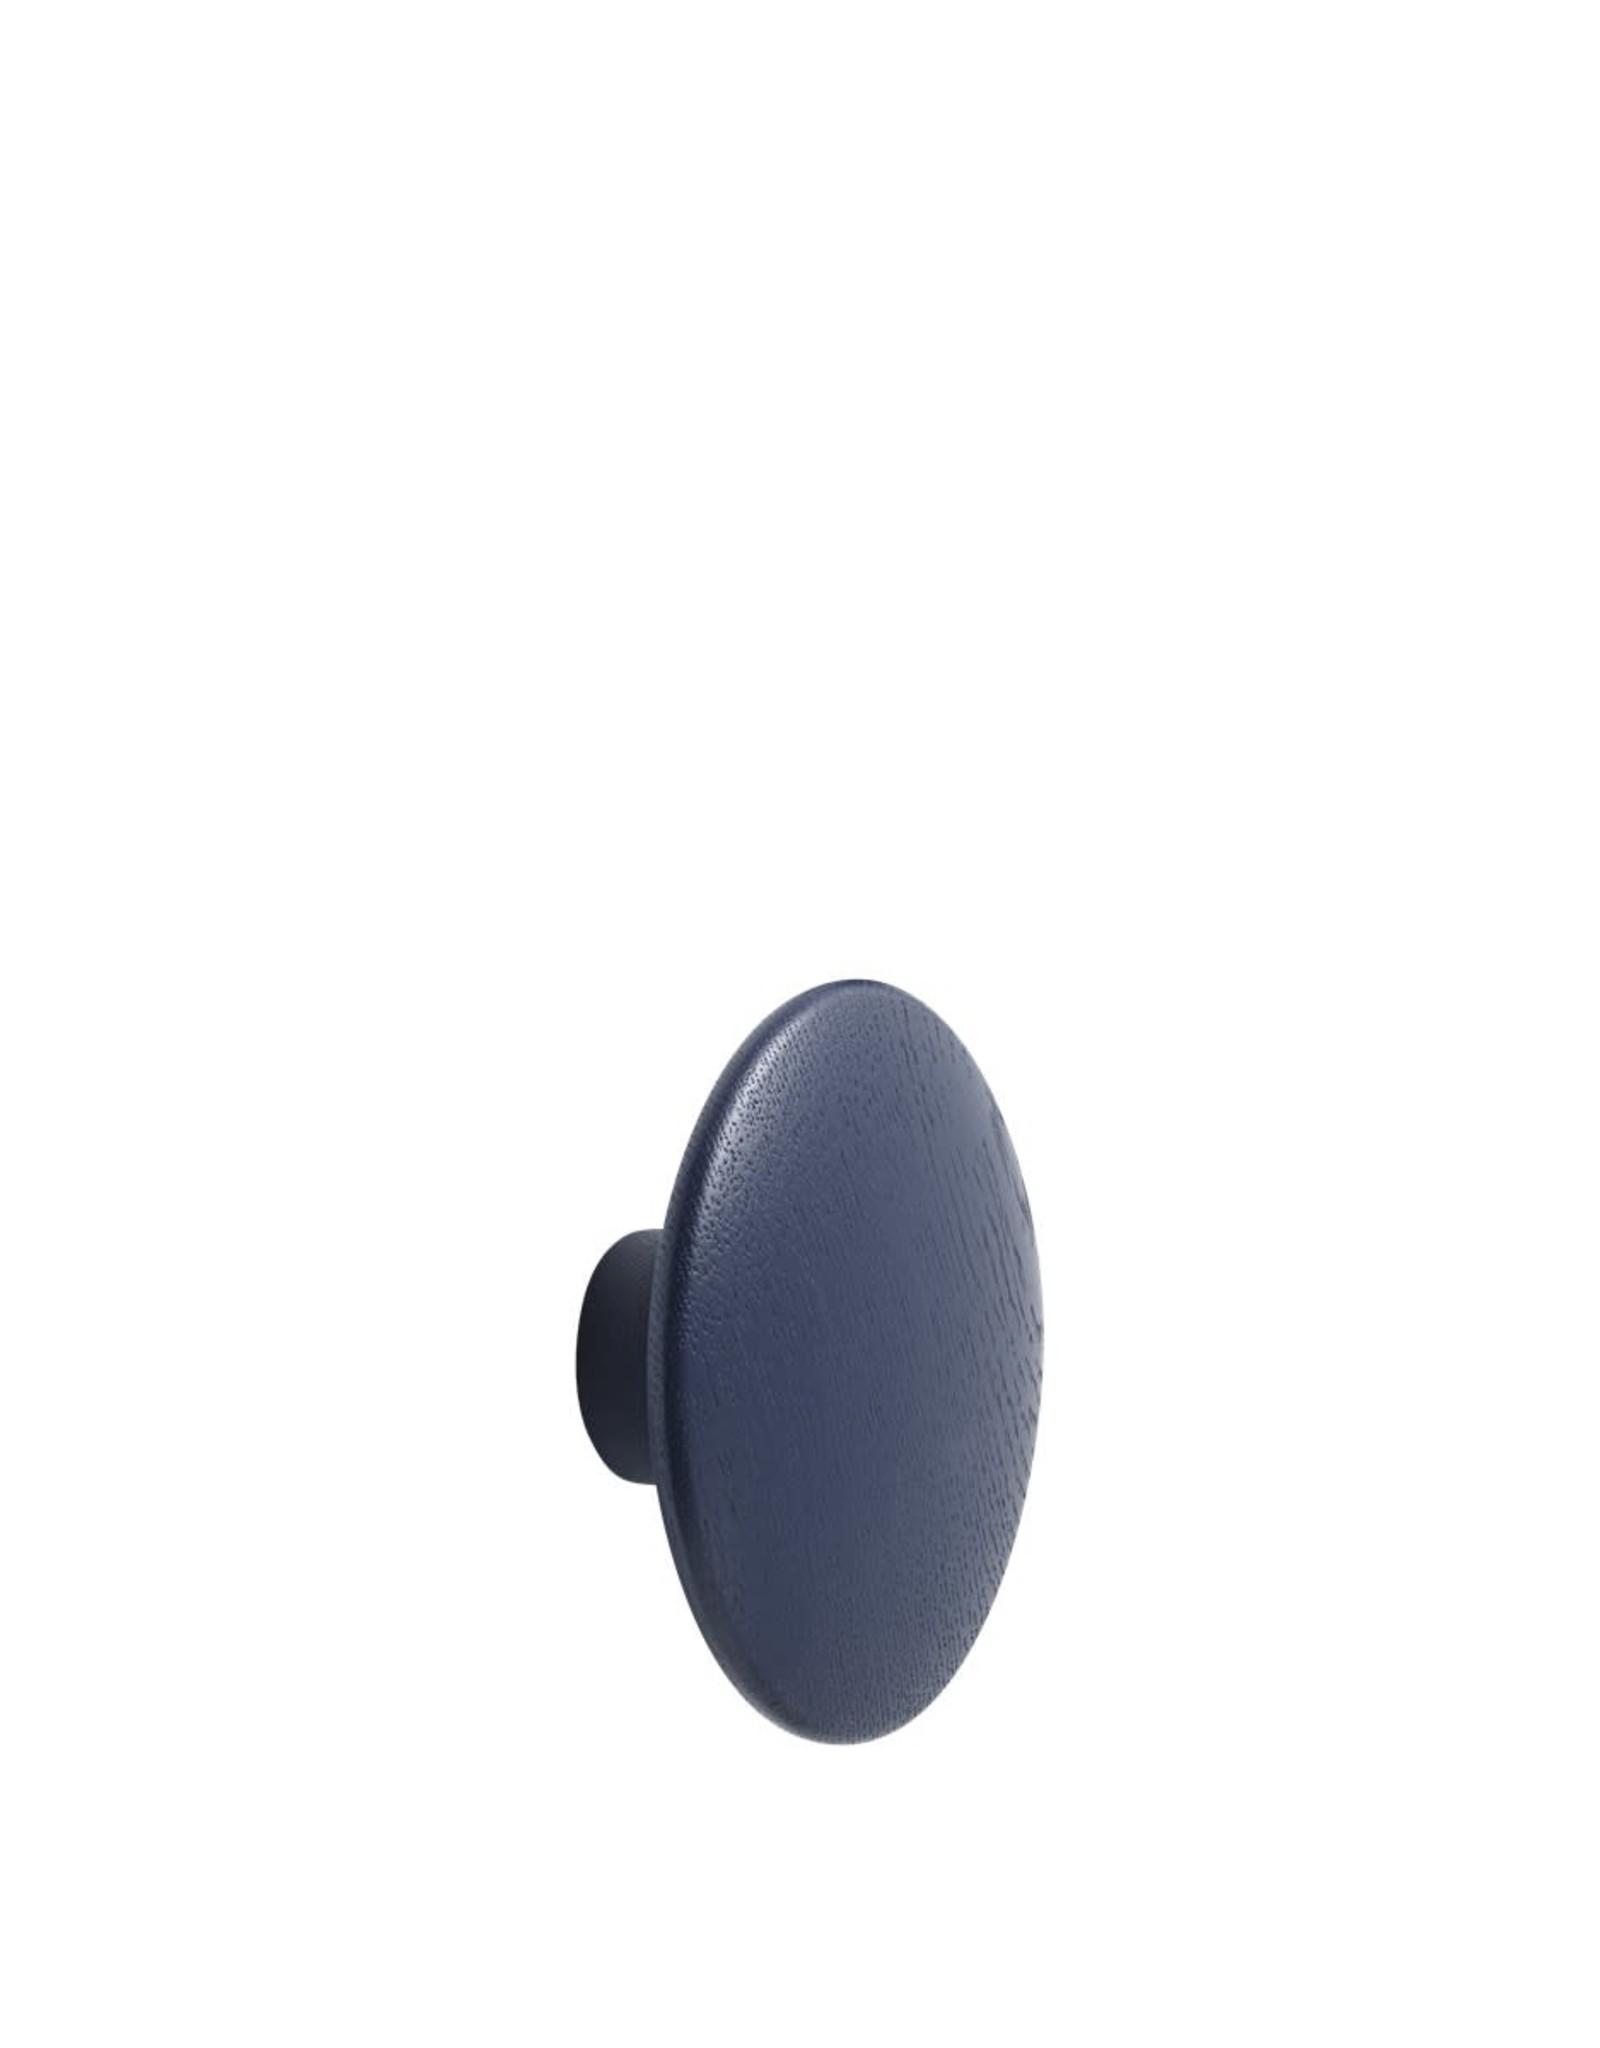 Muuto Muuto Dots Wood 13cm Midnight Blue